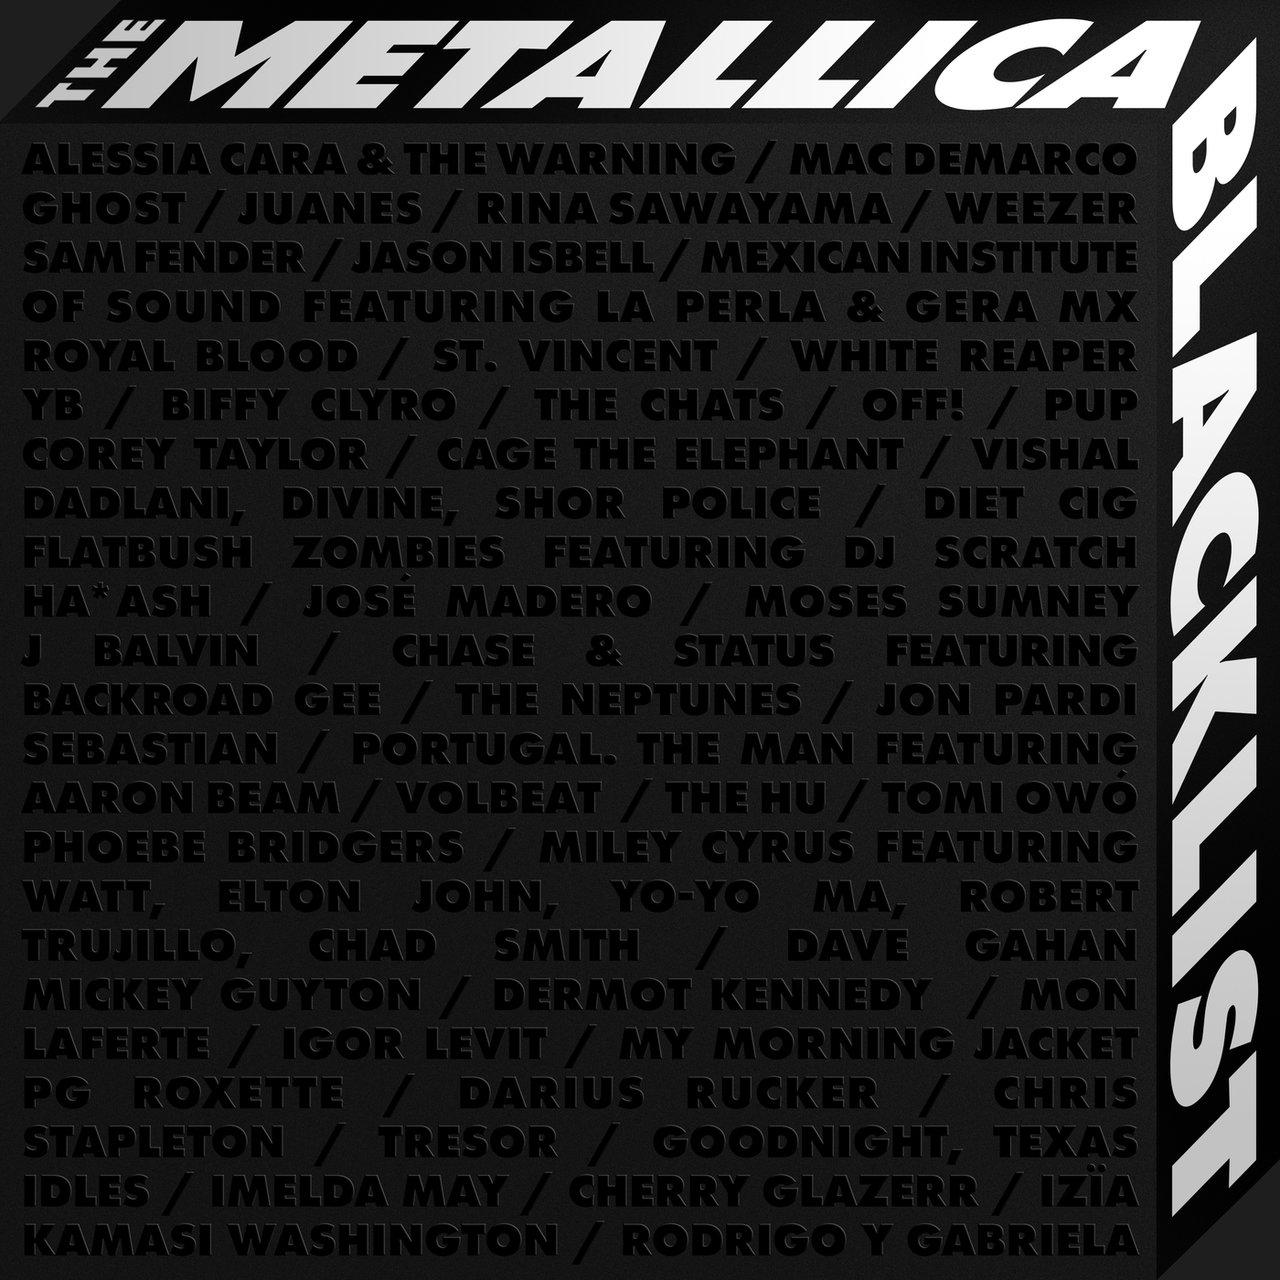 【FLAC/album】The Metallica Blacklist插图